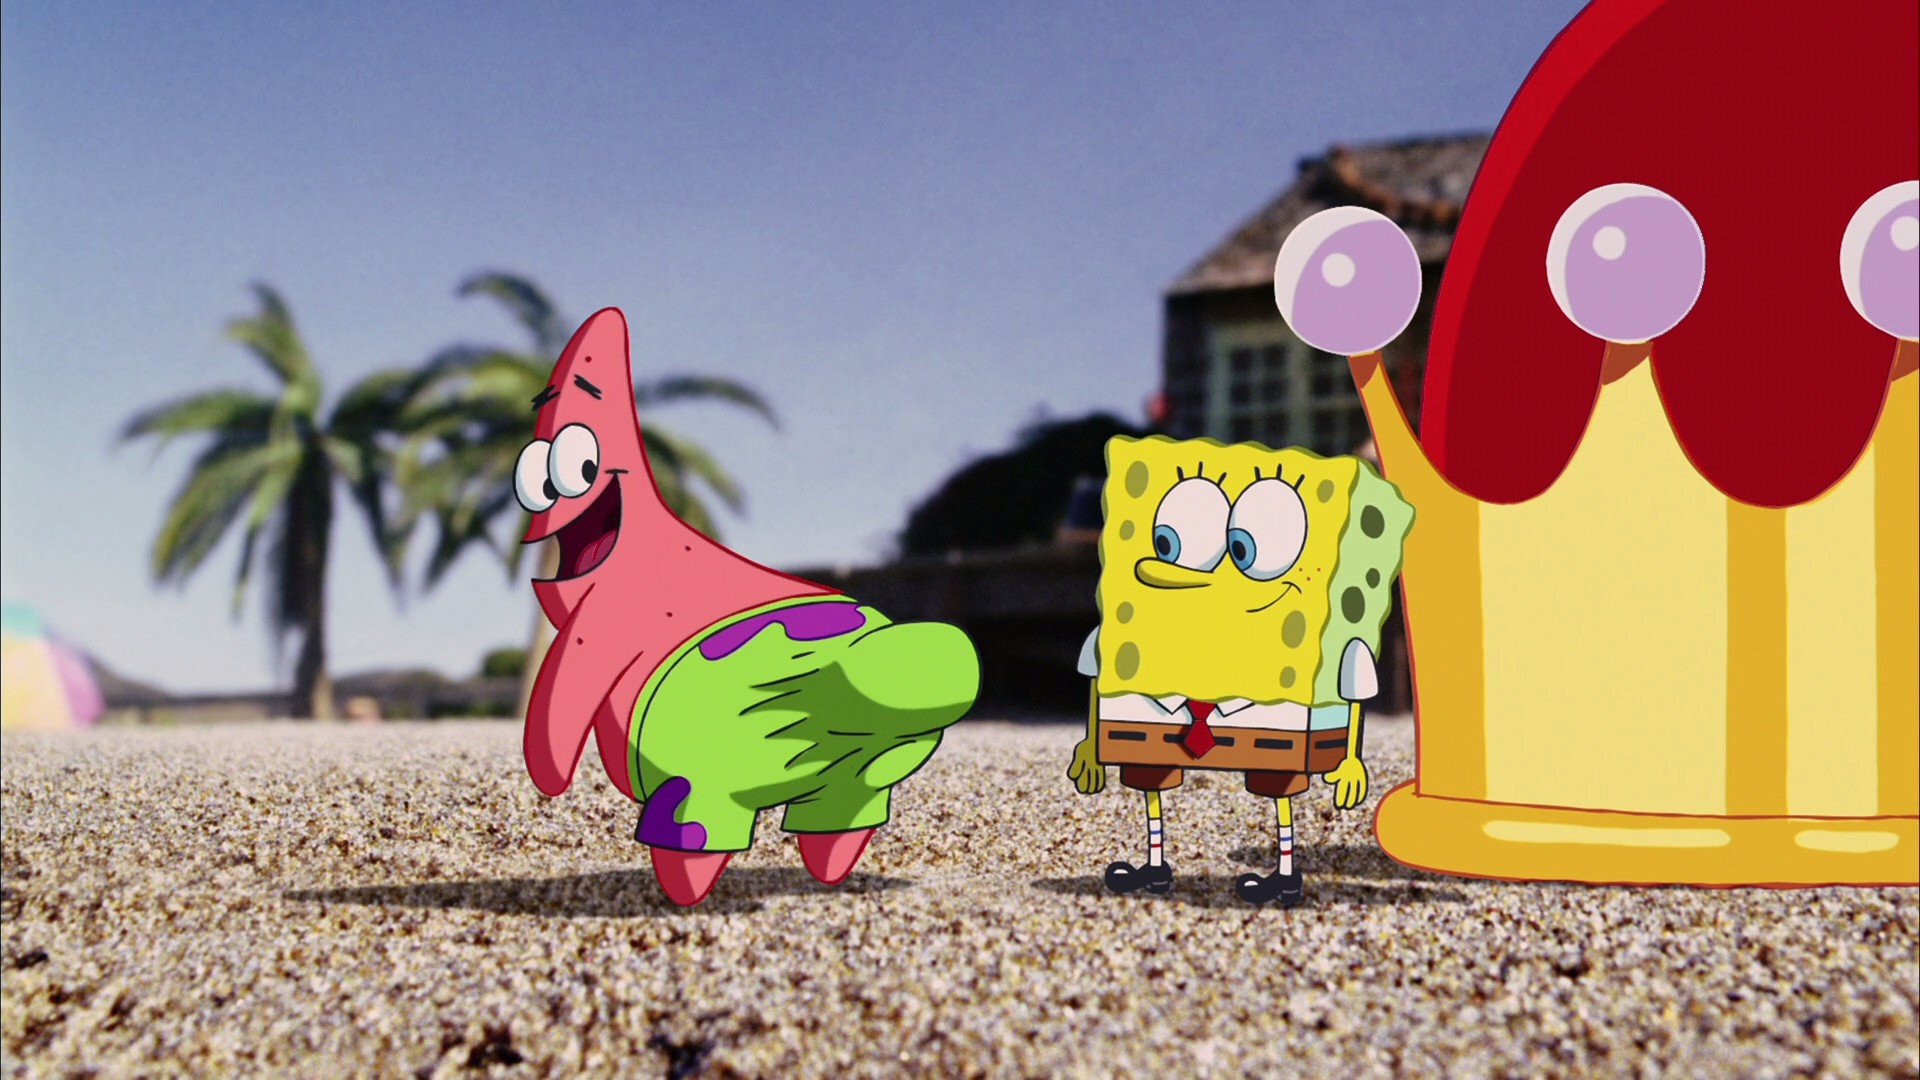 Spongebob Squarepants Hd Wallpaper Background Image 1920x1080